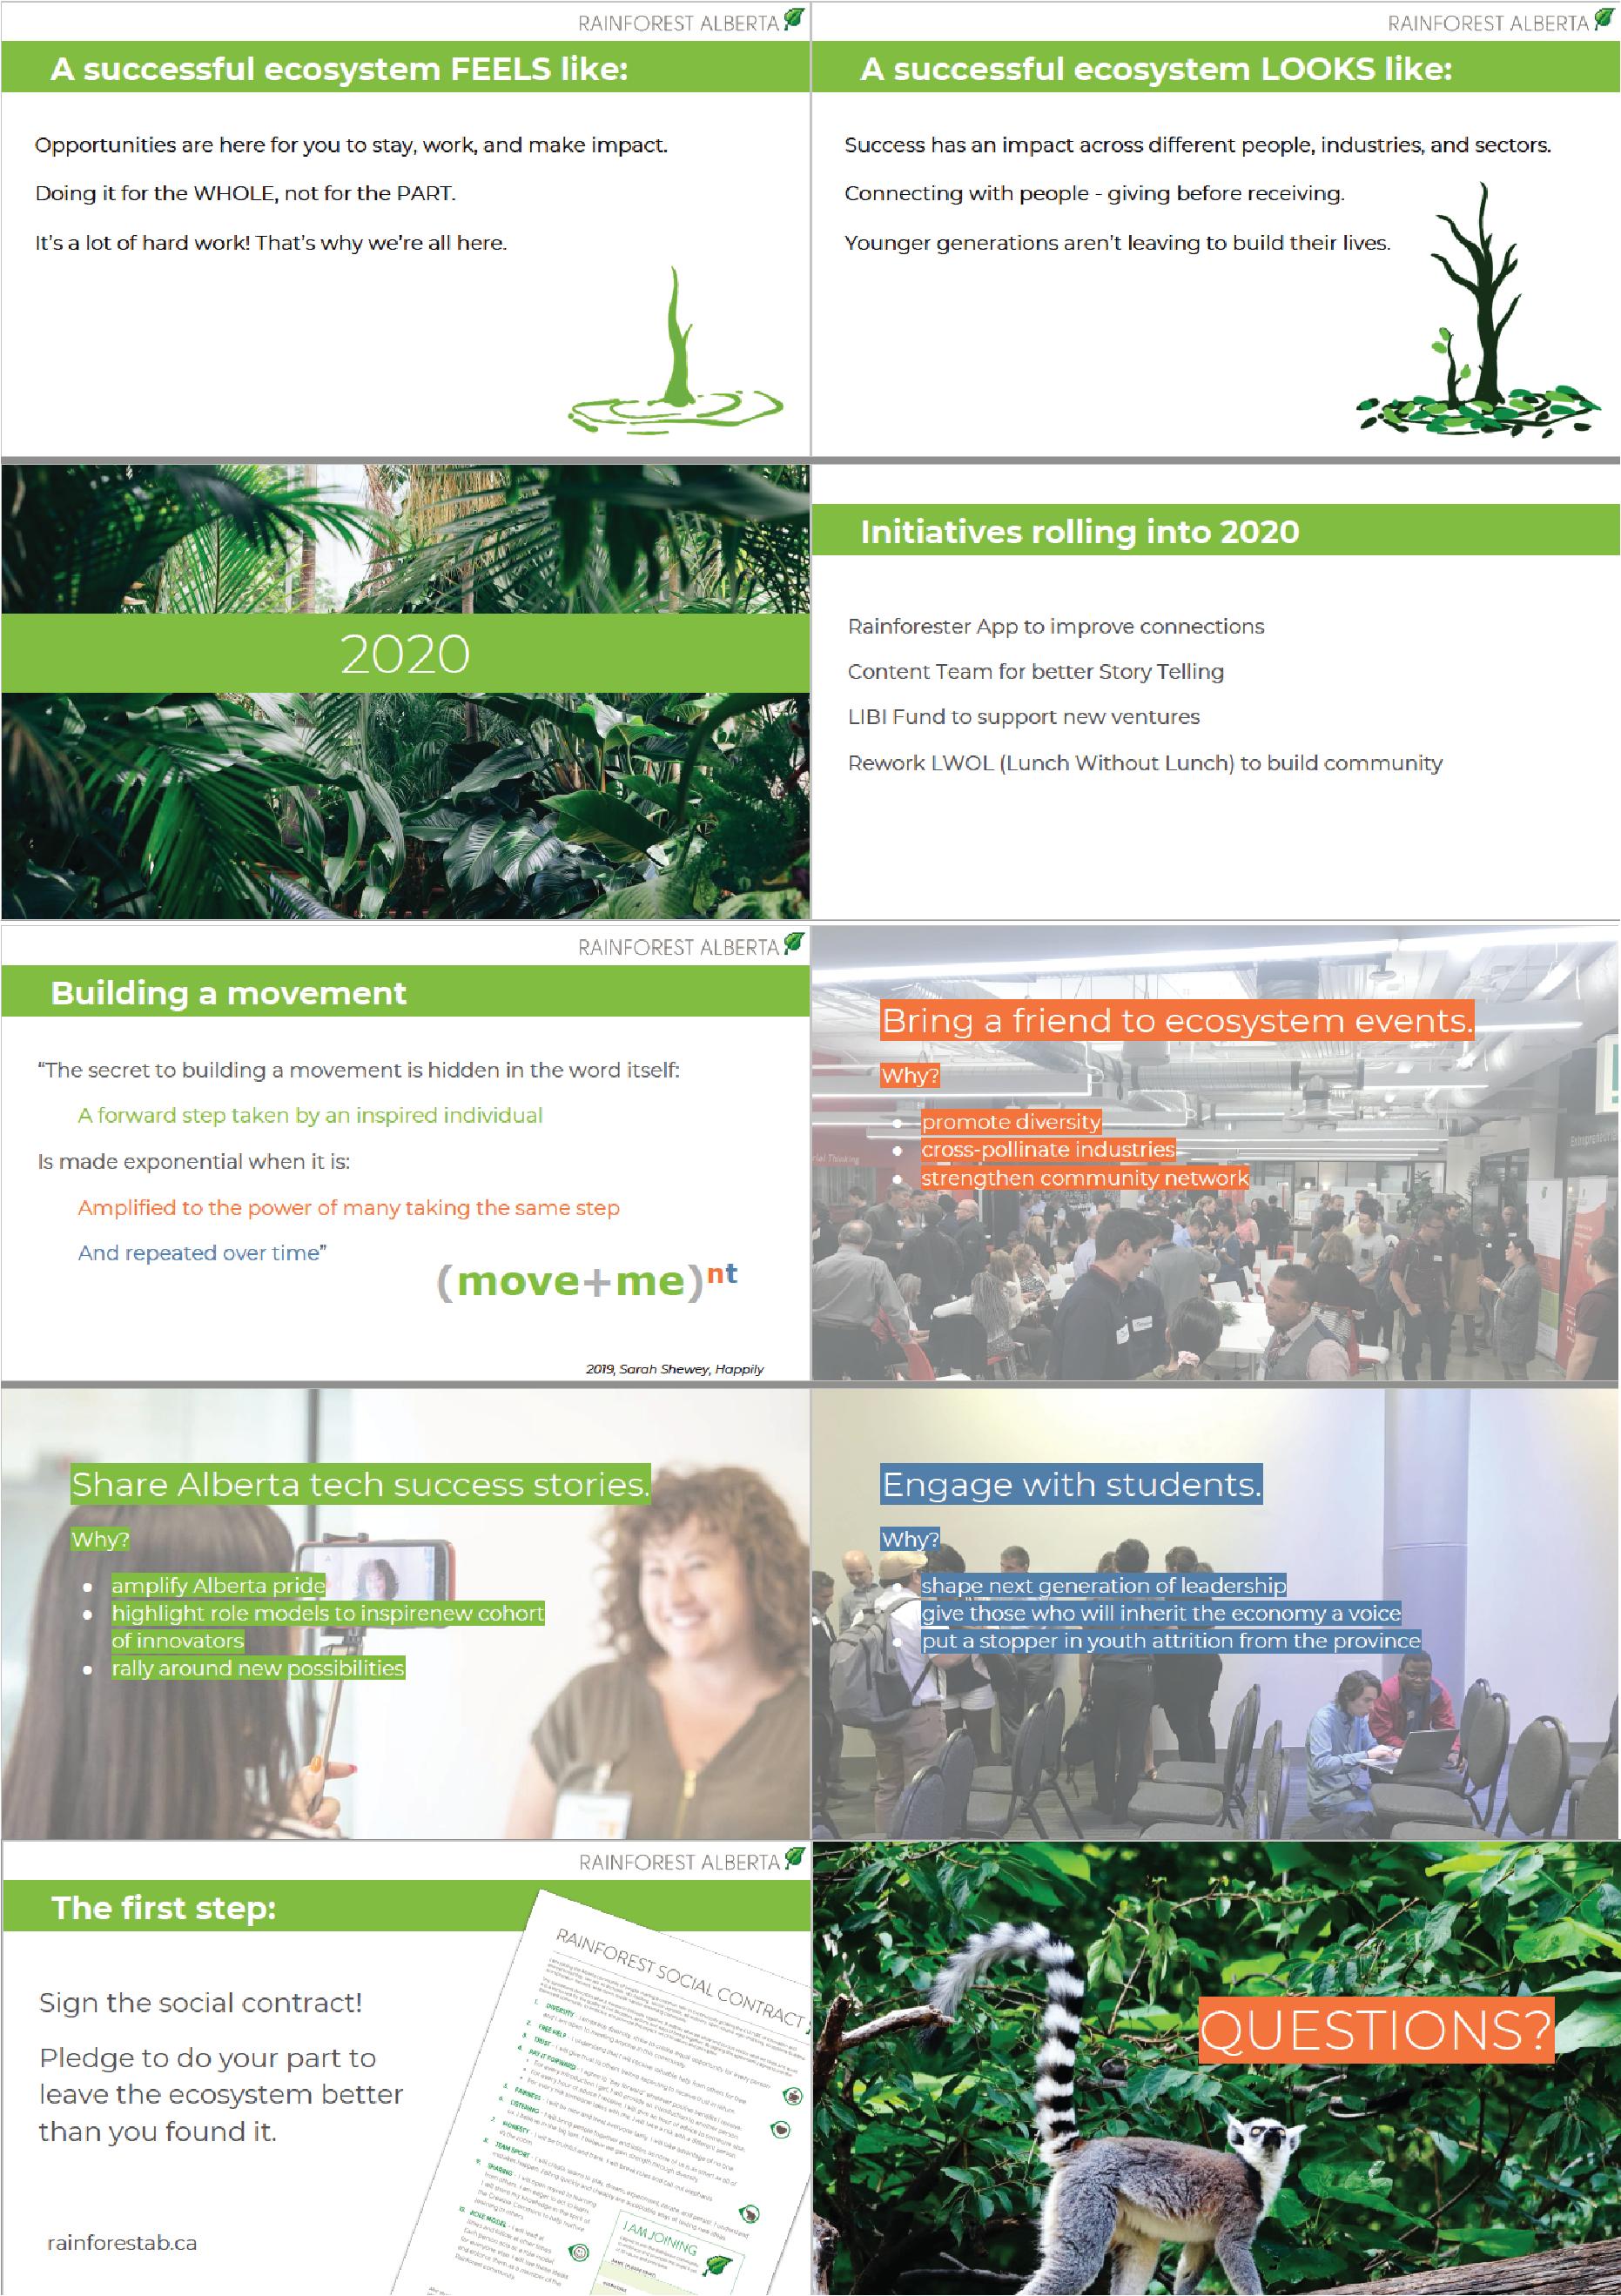 Rainforest 2020 case study pngs-03